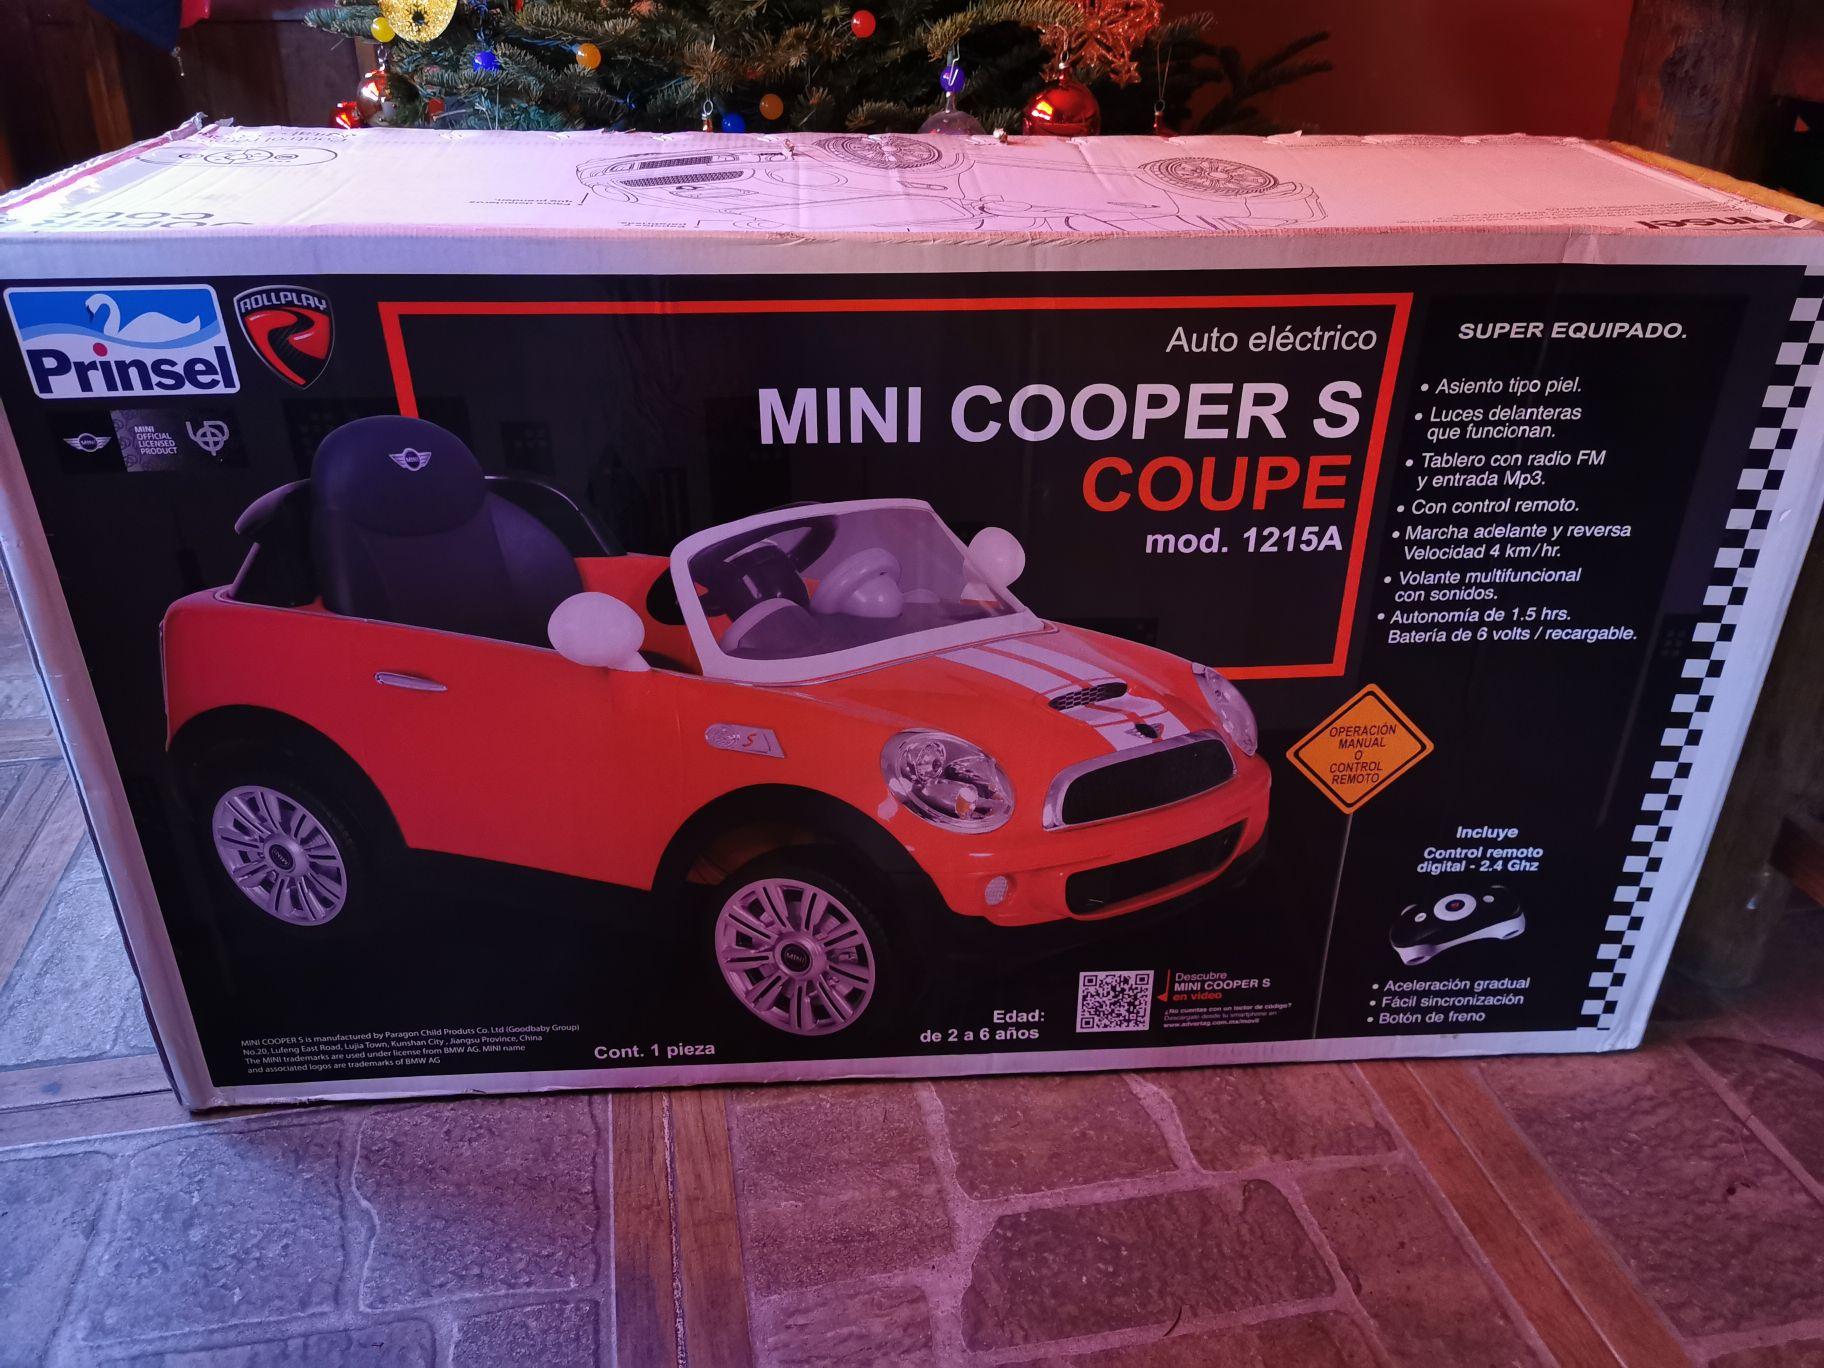 Carrito eléctrico mini cooper prinsel 30% menos